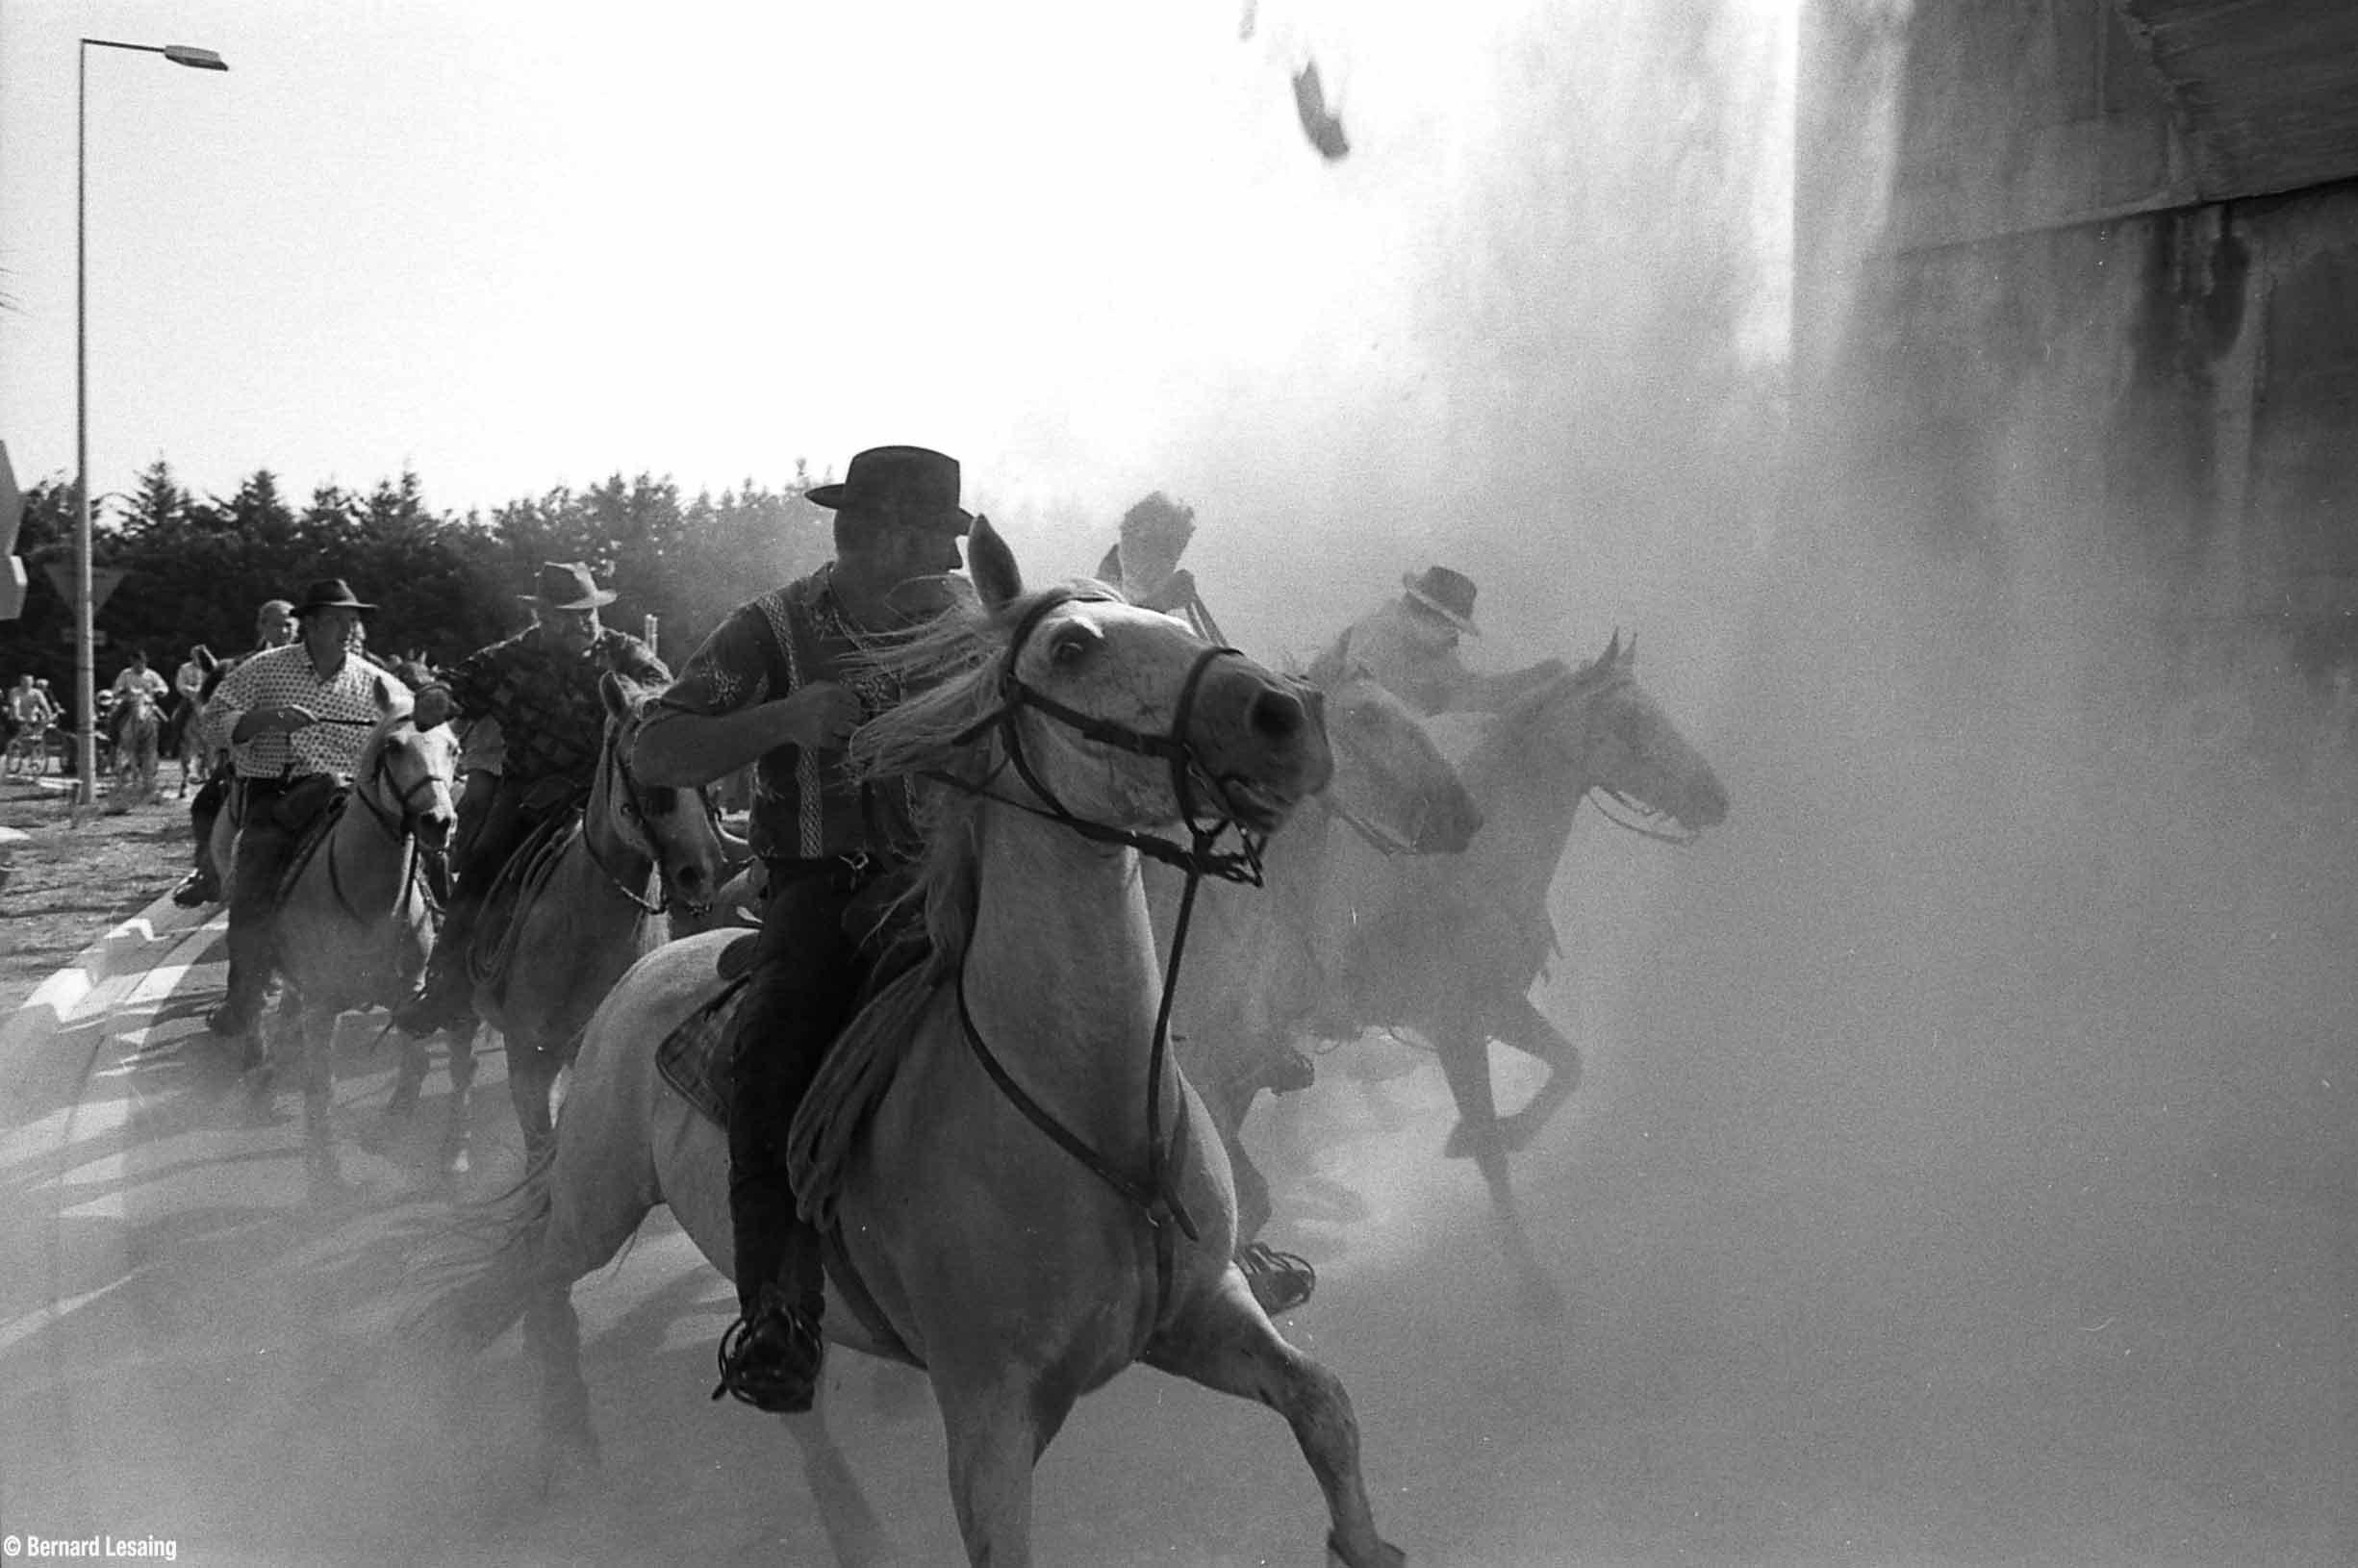 Saint Rémy de Provence, 2004-2005 © Bernard Lesaing